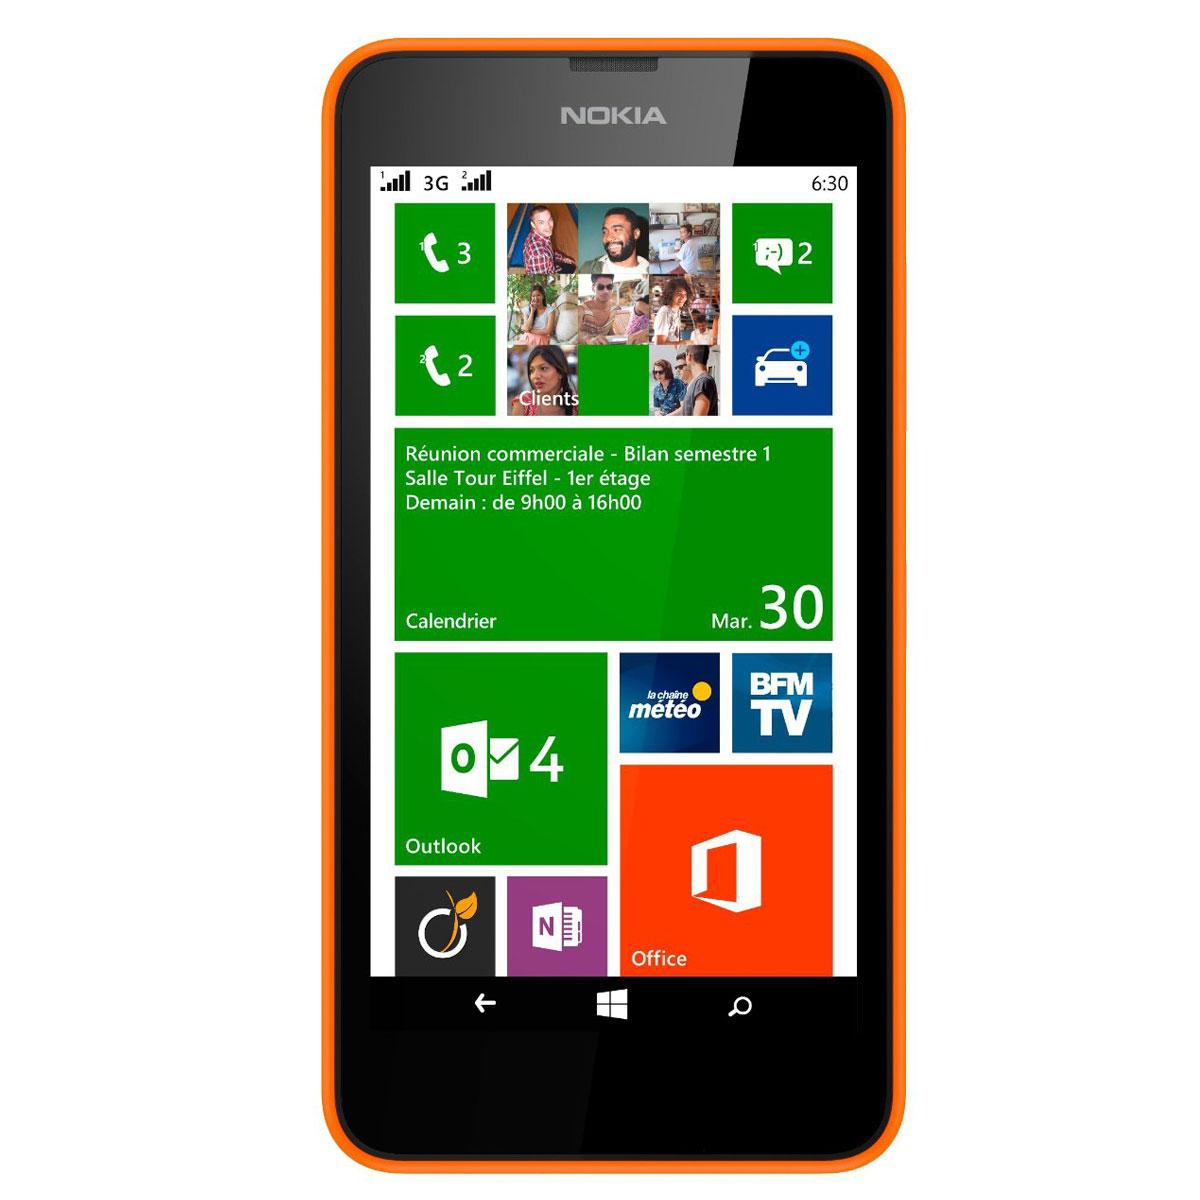 nokia lumia 630 dual sim orange mobile smartphone nokia sur. Black Bedroom Furniture Sets. Home Design Ideas